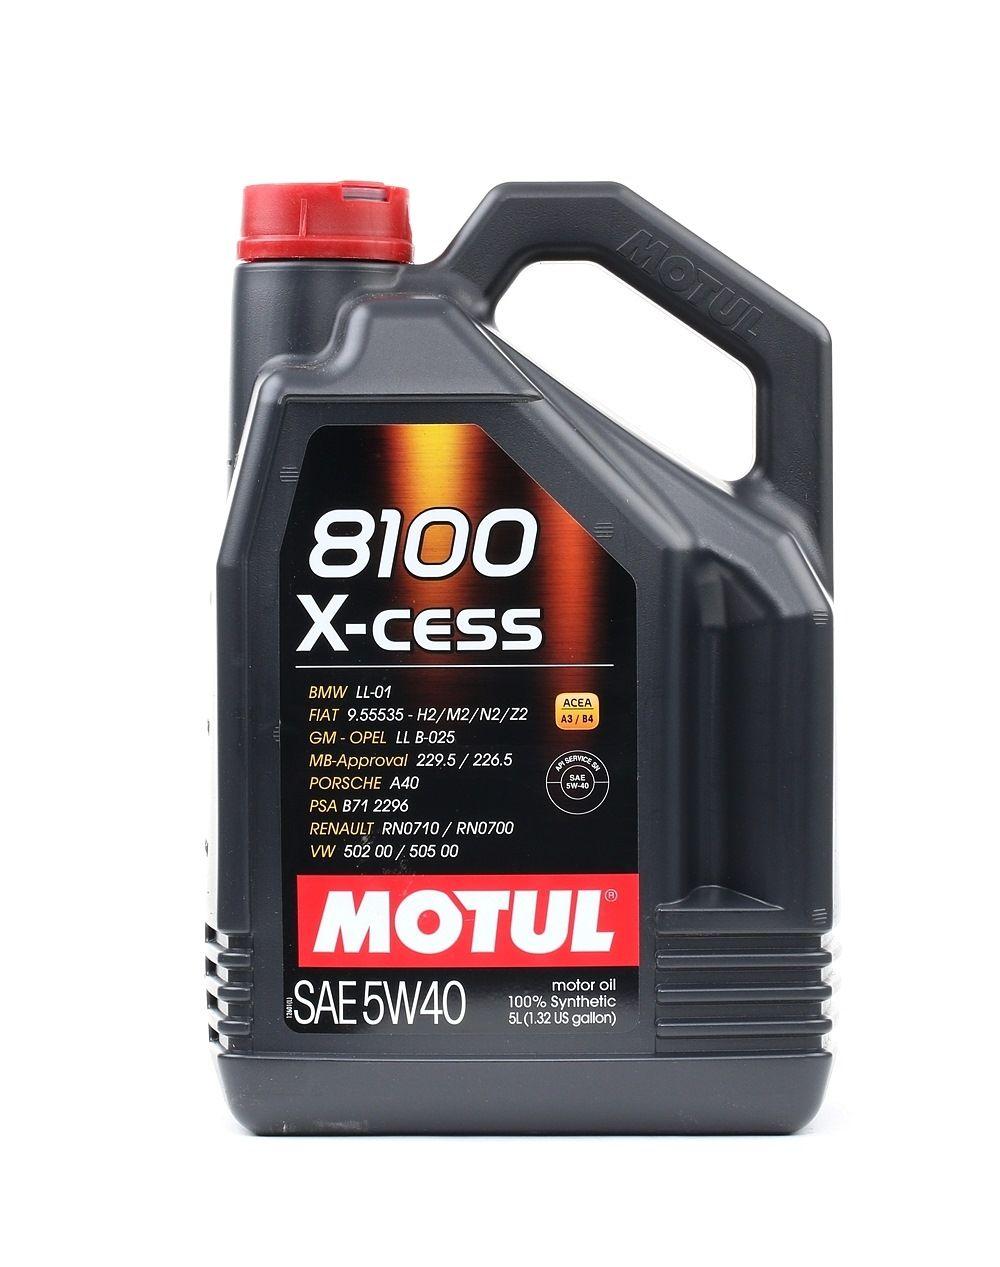 Acquistare ricambi originali MOTUL Olio motore X-CESS 102870